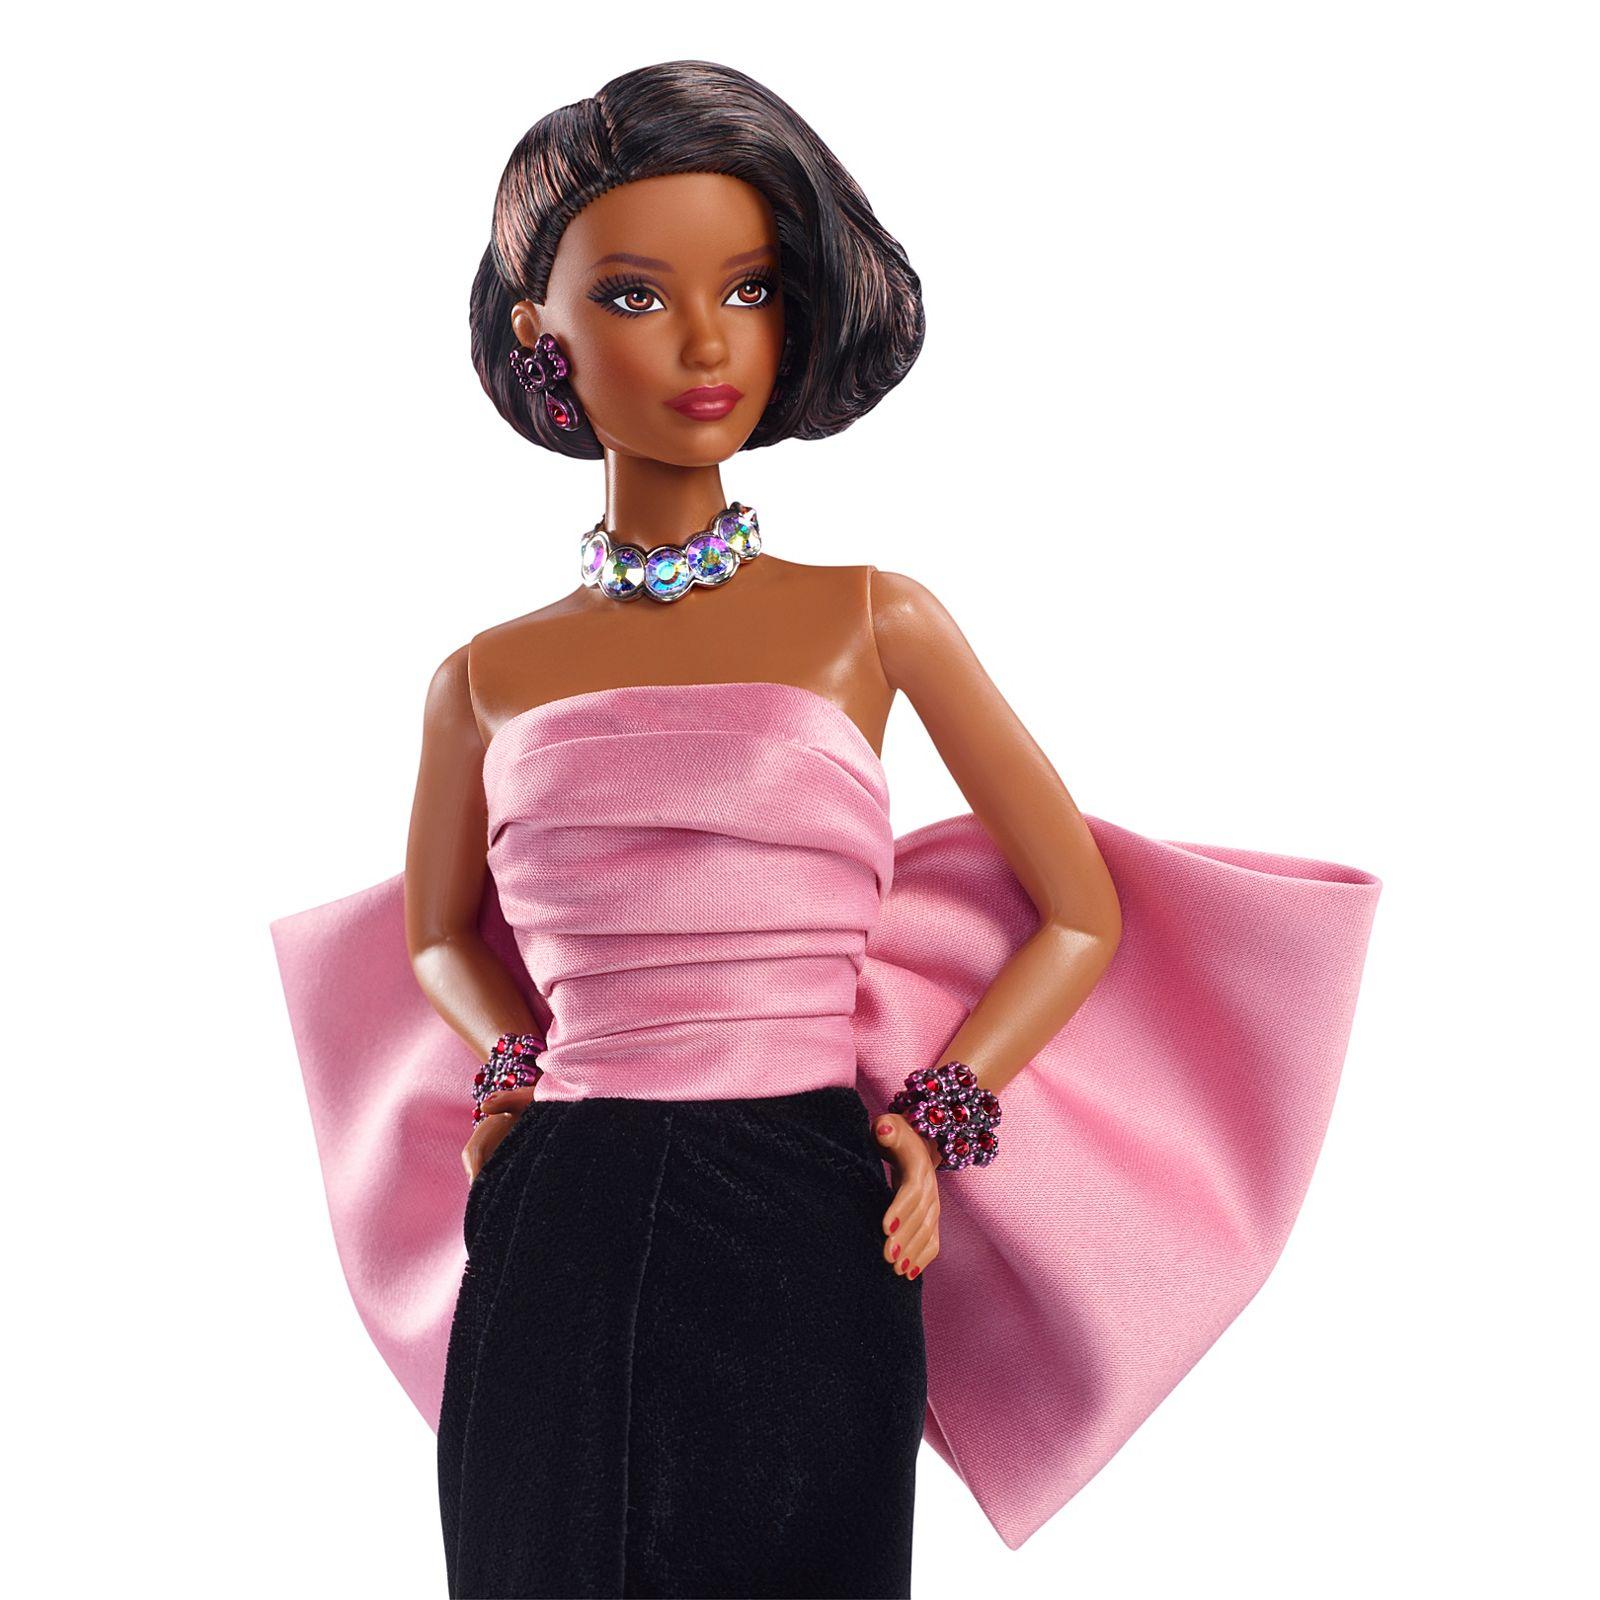 c753f5b856b11 Yves Saint-Laurent — The Fashion Doll Chronicles — Fashion Doll ...